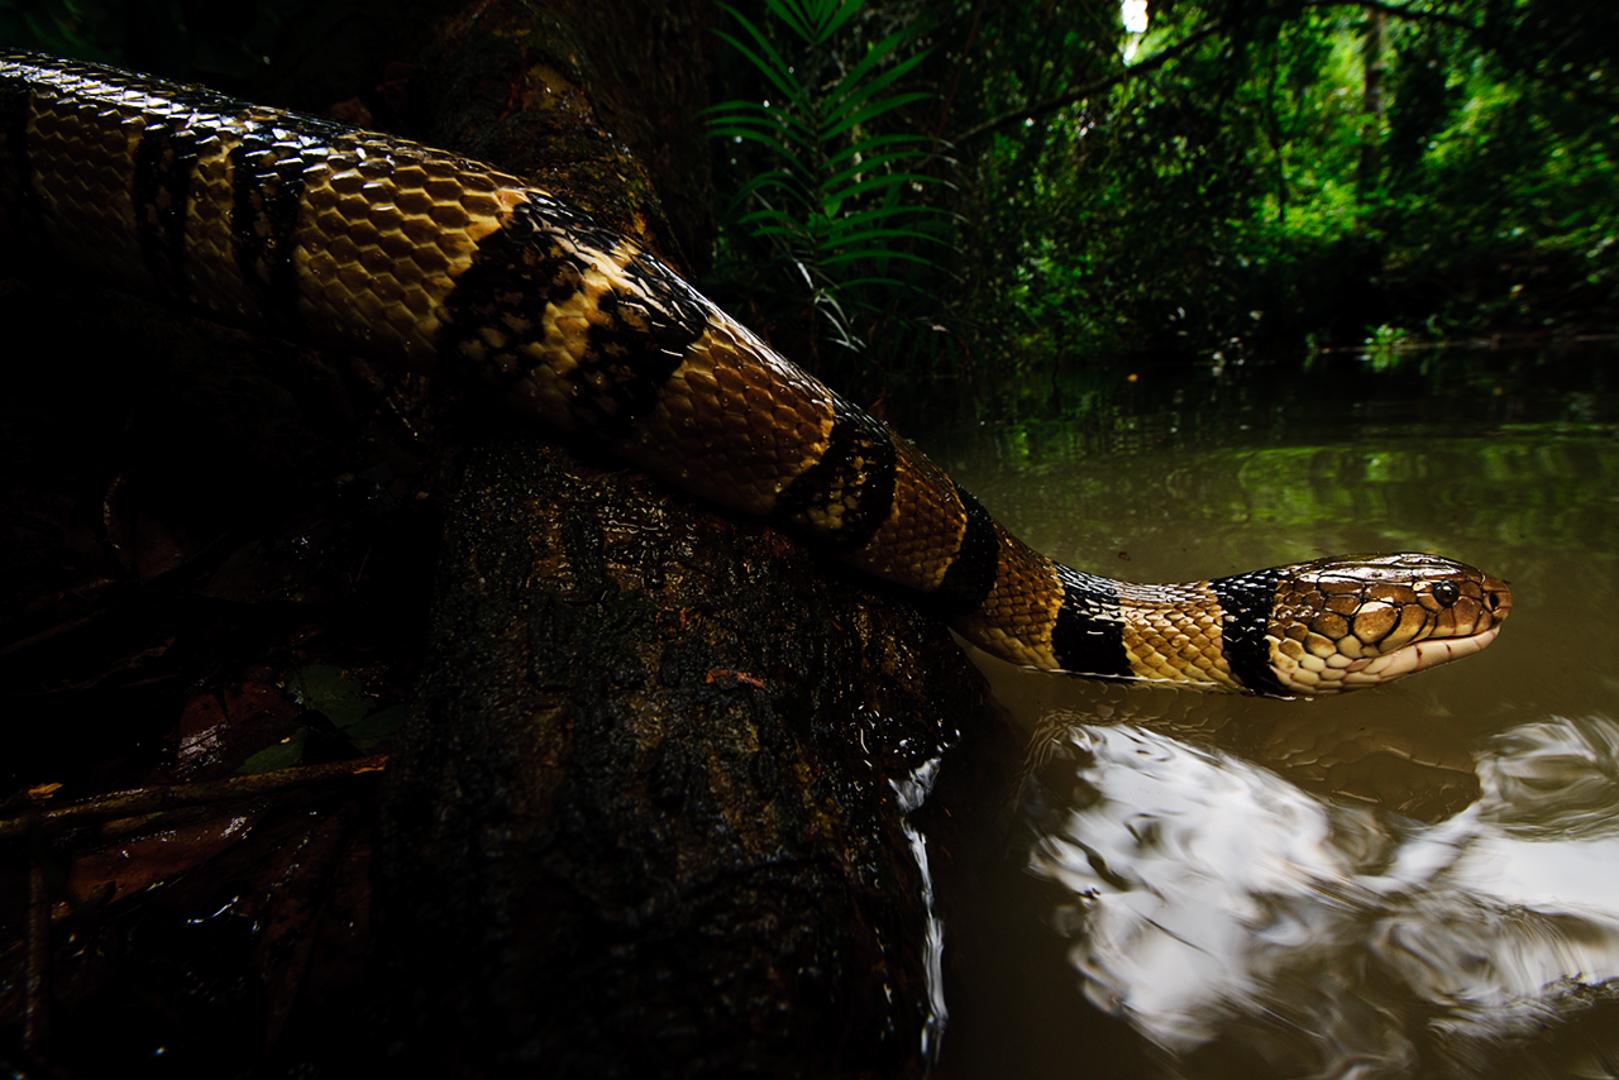 Water cobra (Boulengerina).